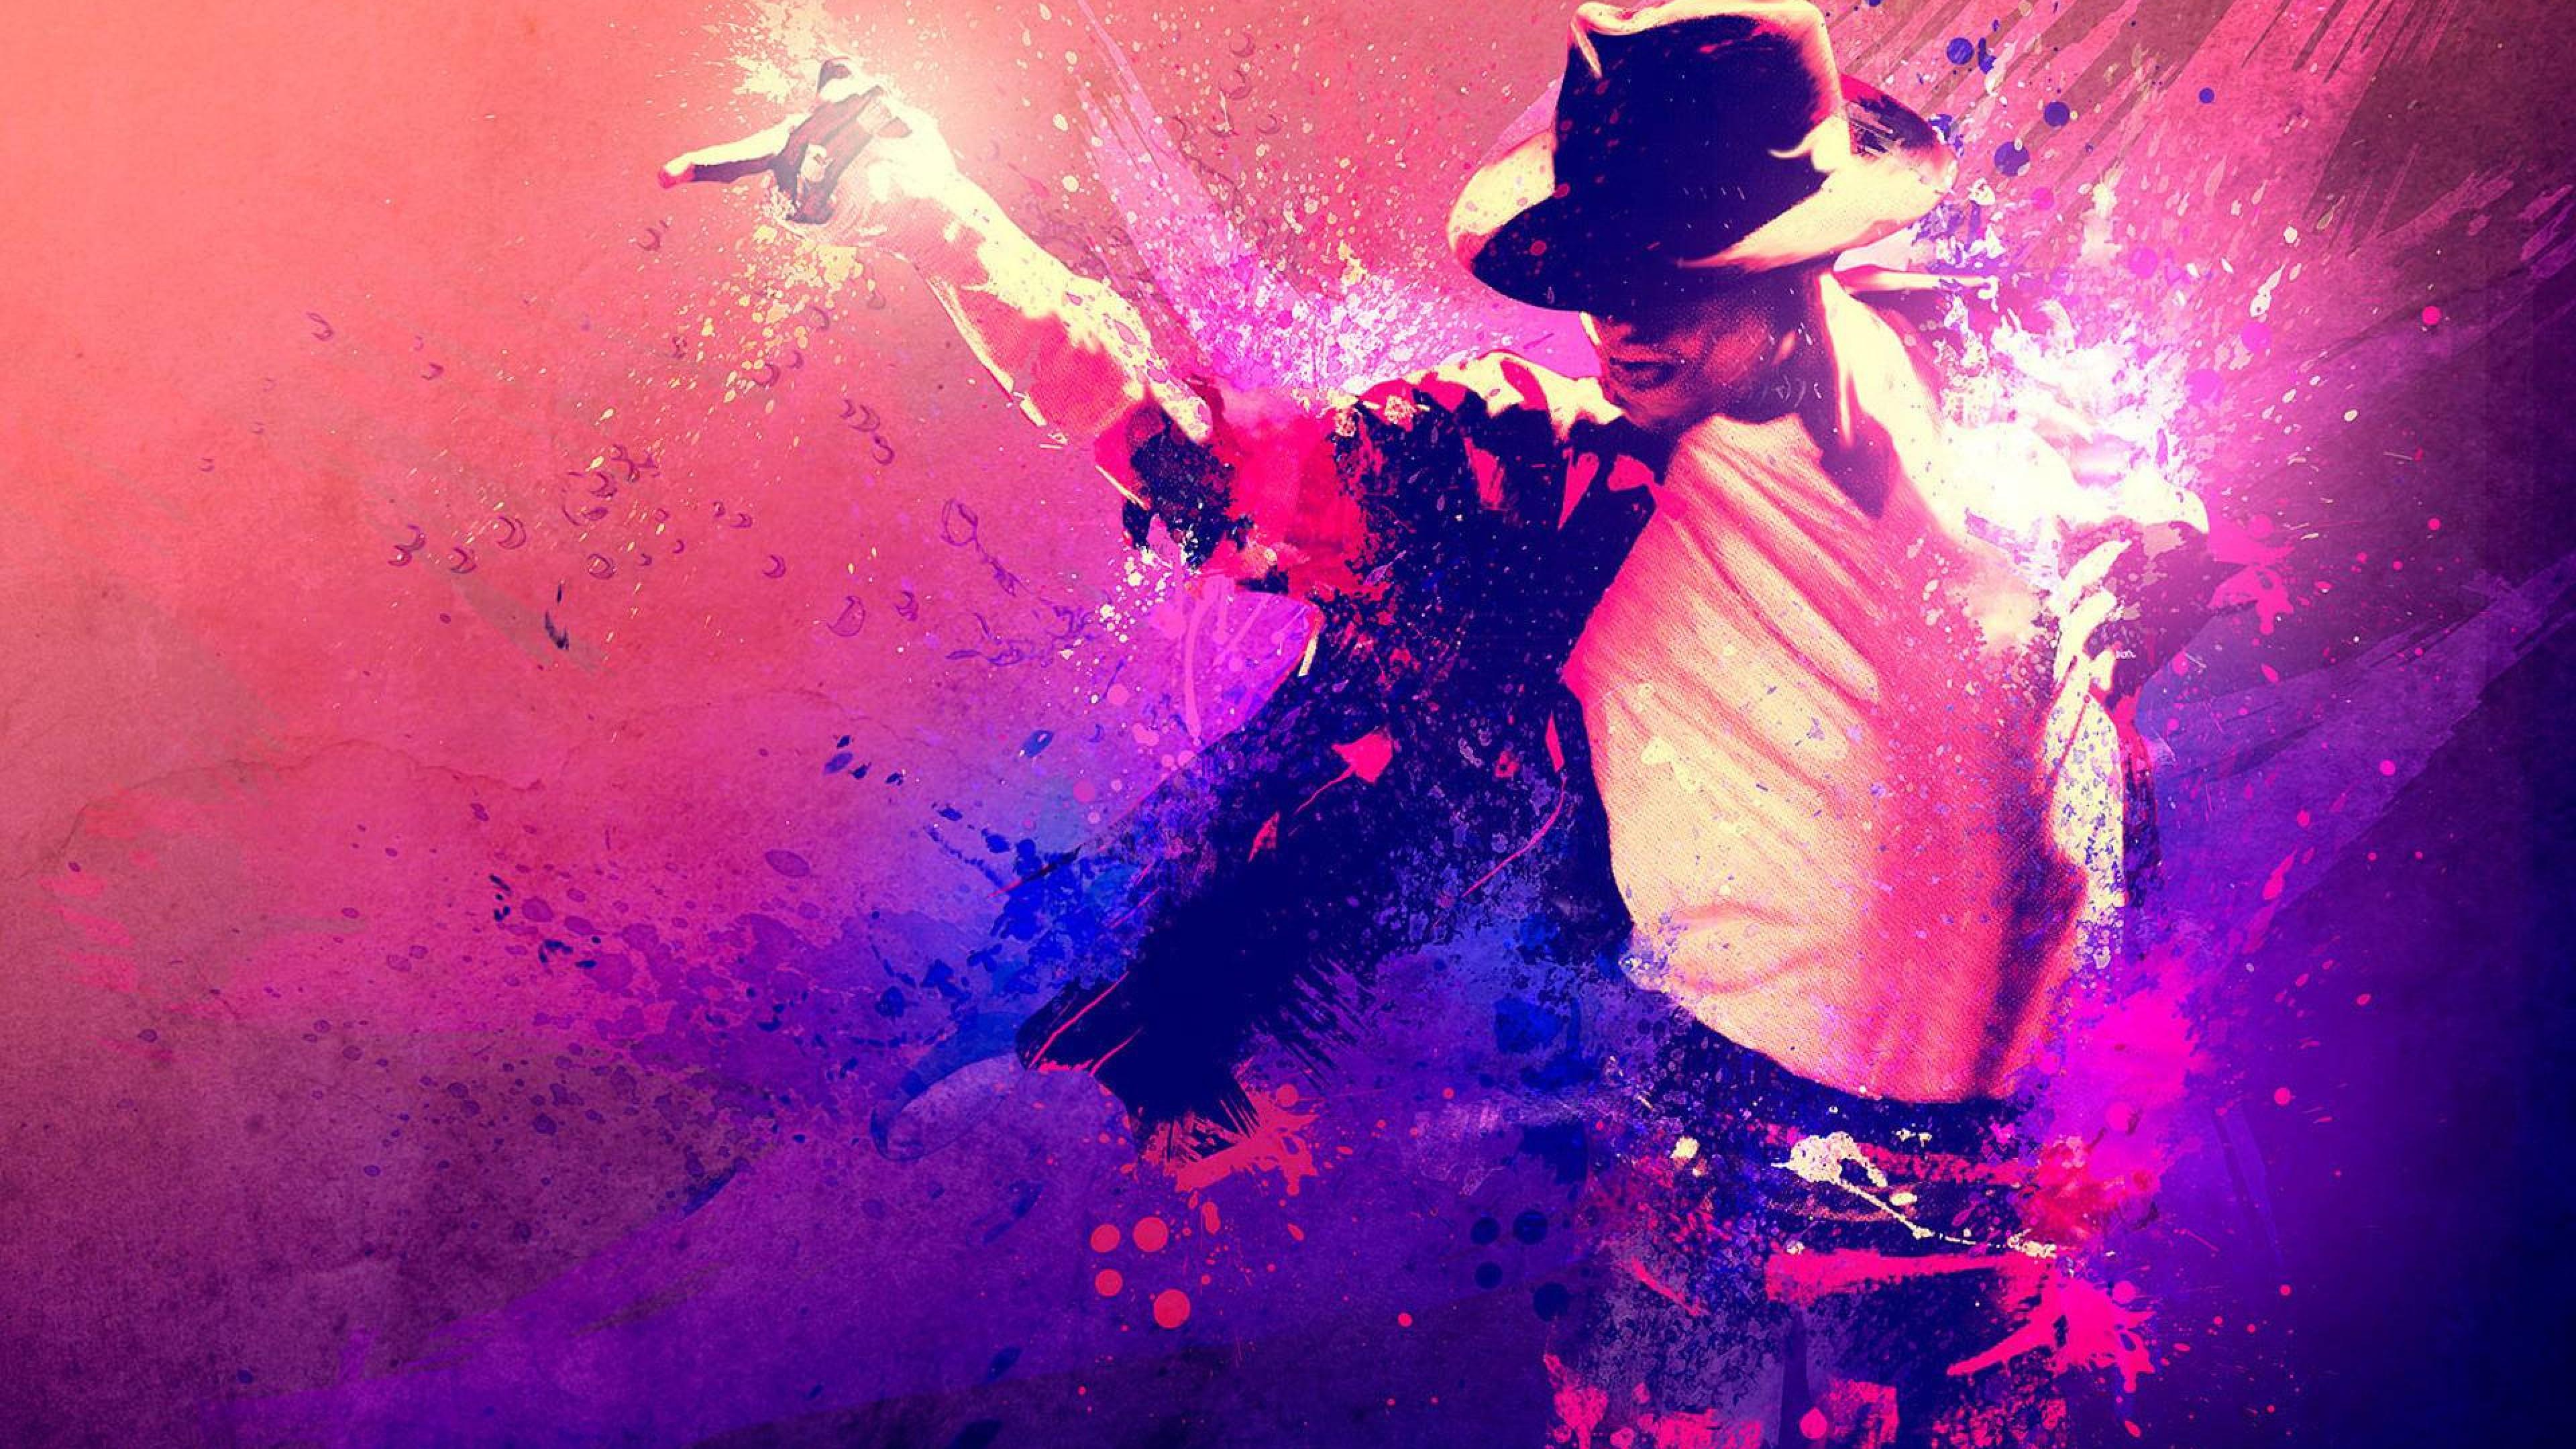 танец креативное dance creative  № 3510335 бесплатно